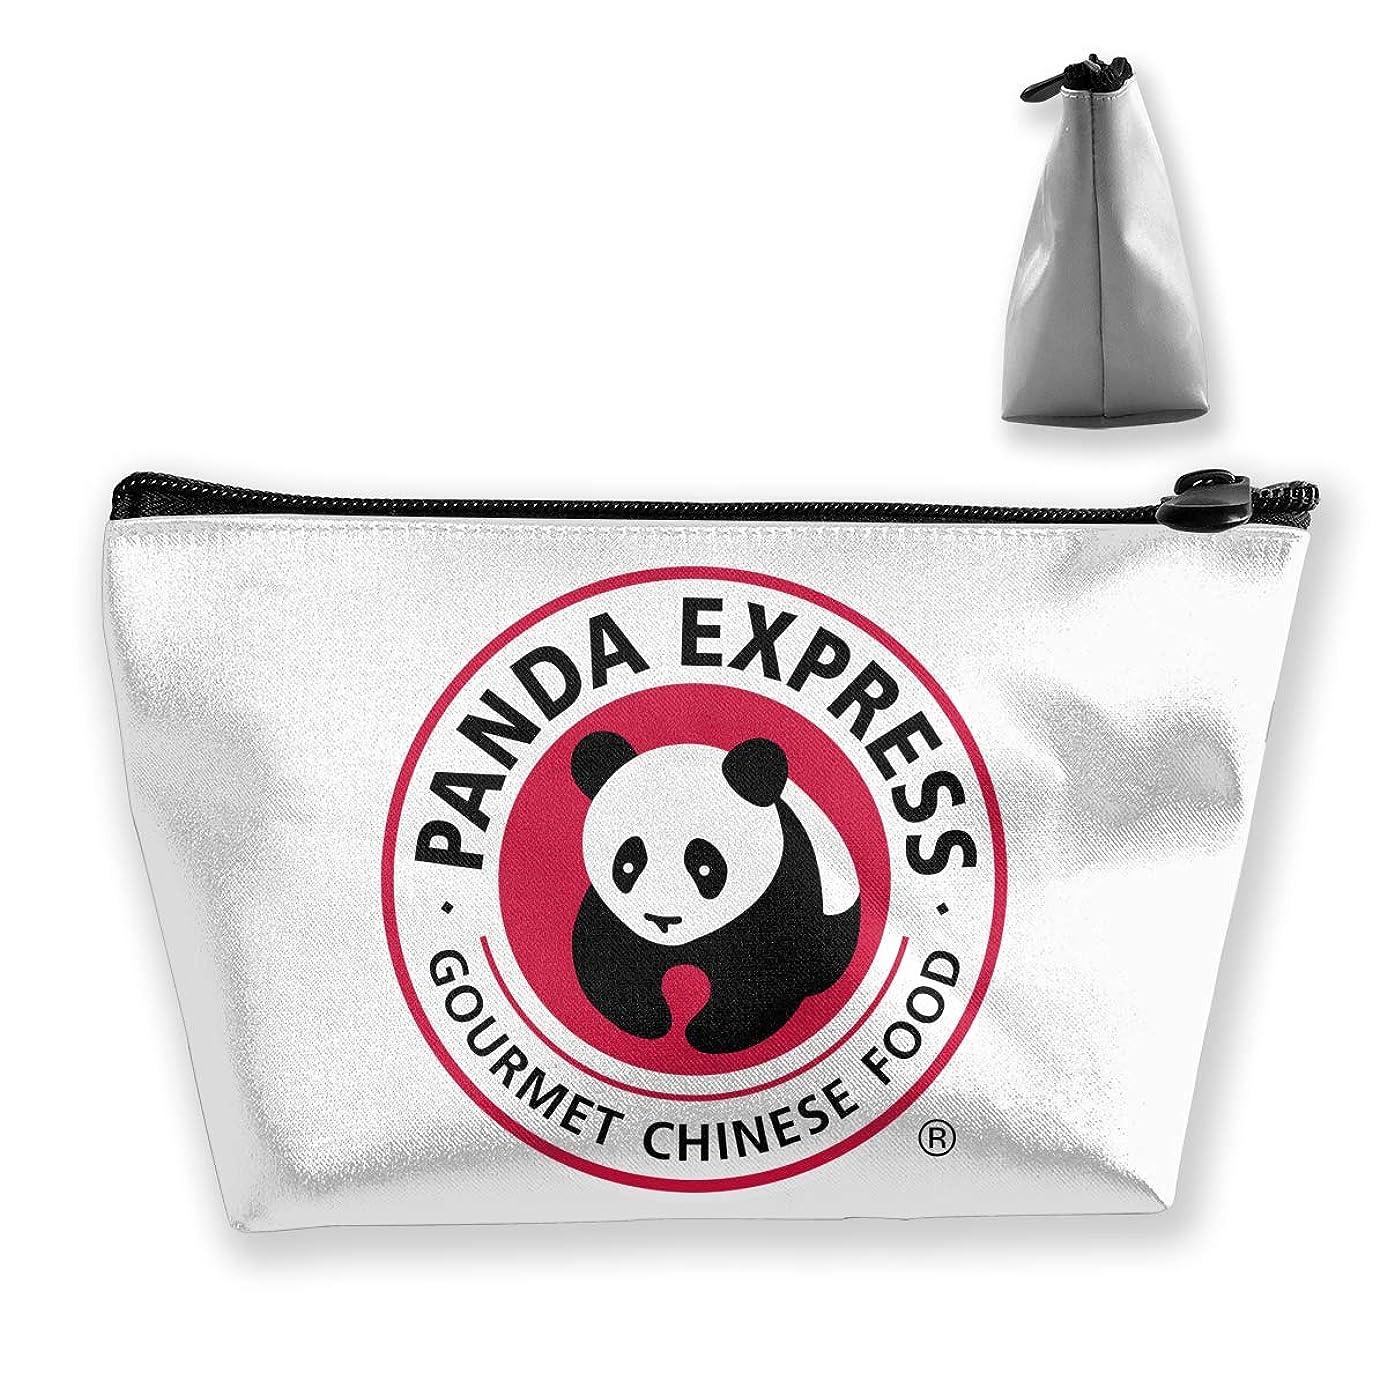 Trapezoid Toiletry Pouch Portable Travel Bag Panda Express Makeup Bag